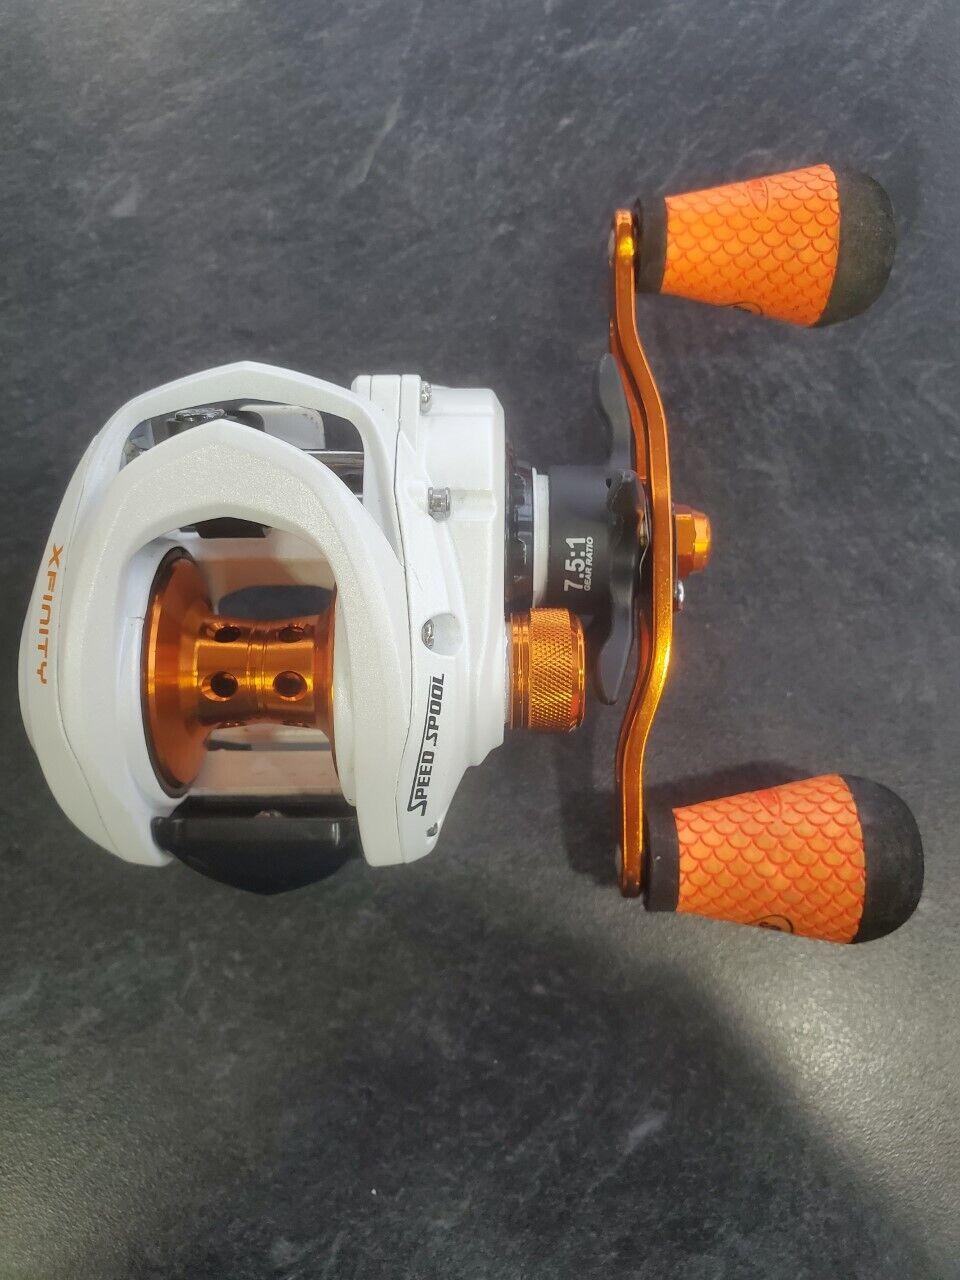 Lews Xfinity XF1SH Speed Spool Reel - orange - RH - 7.5 1 Ratio - 8 Bearing - $55.00